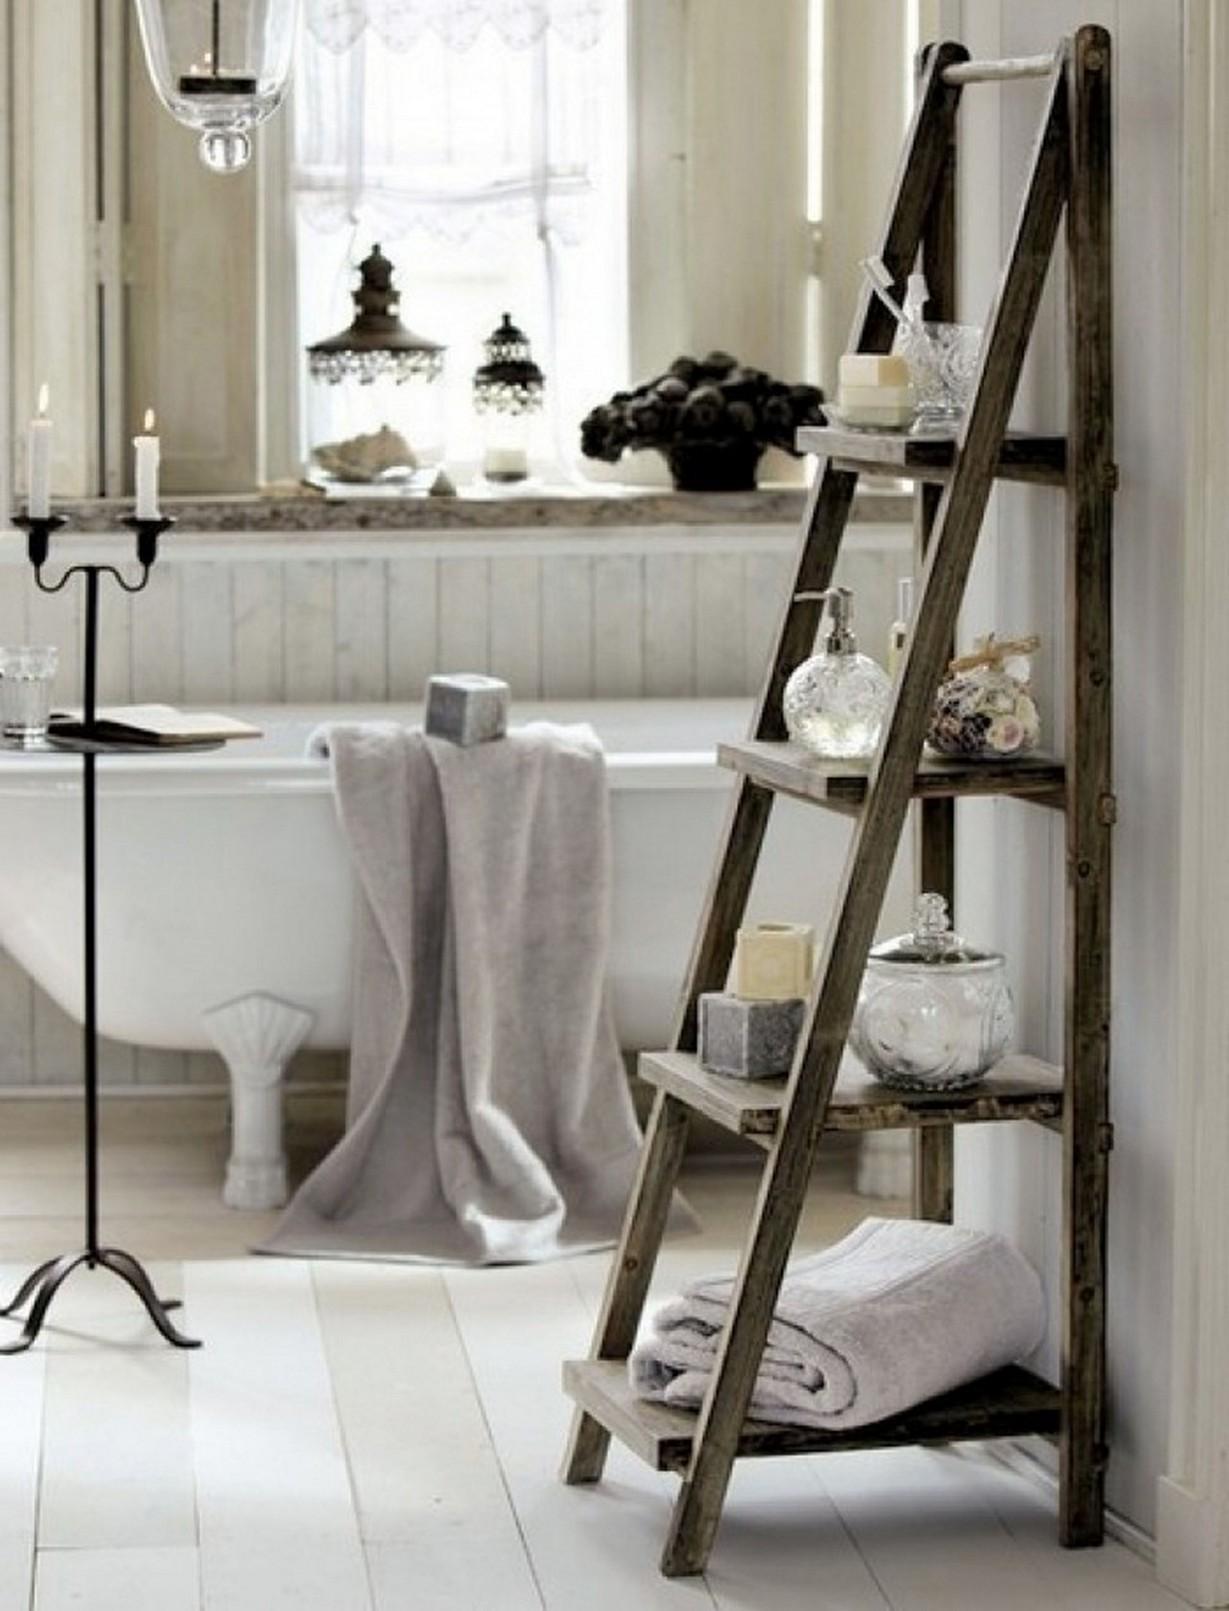 Towel Rack Ideas More Beautiful Bathroom - Decoratorist ...